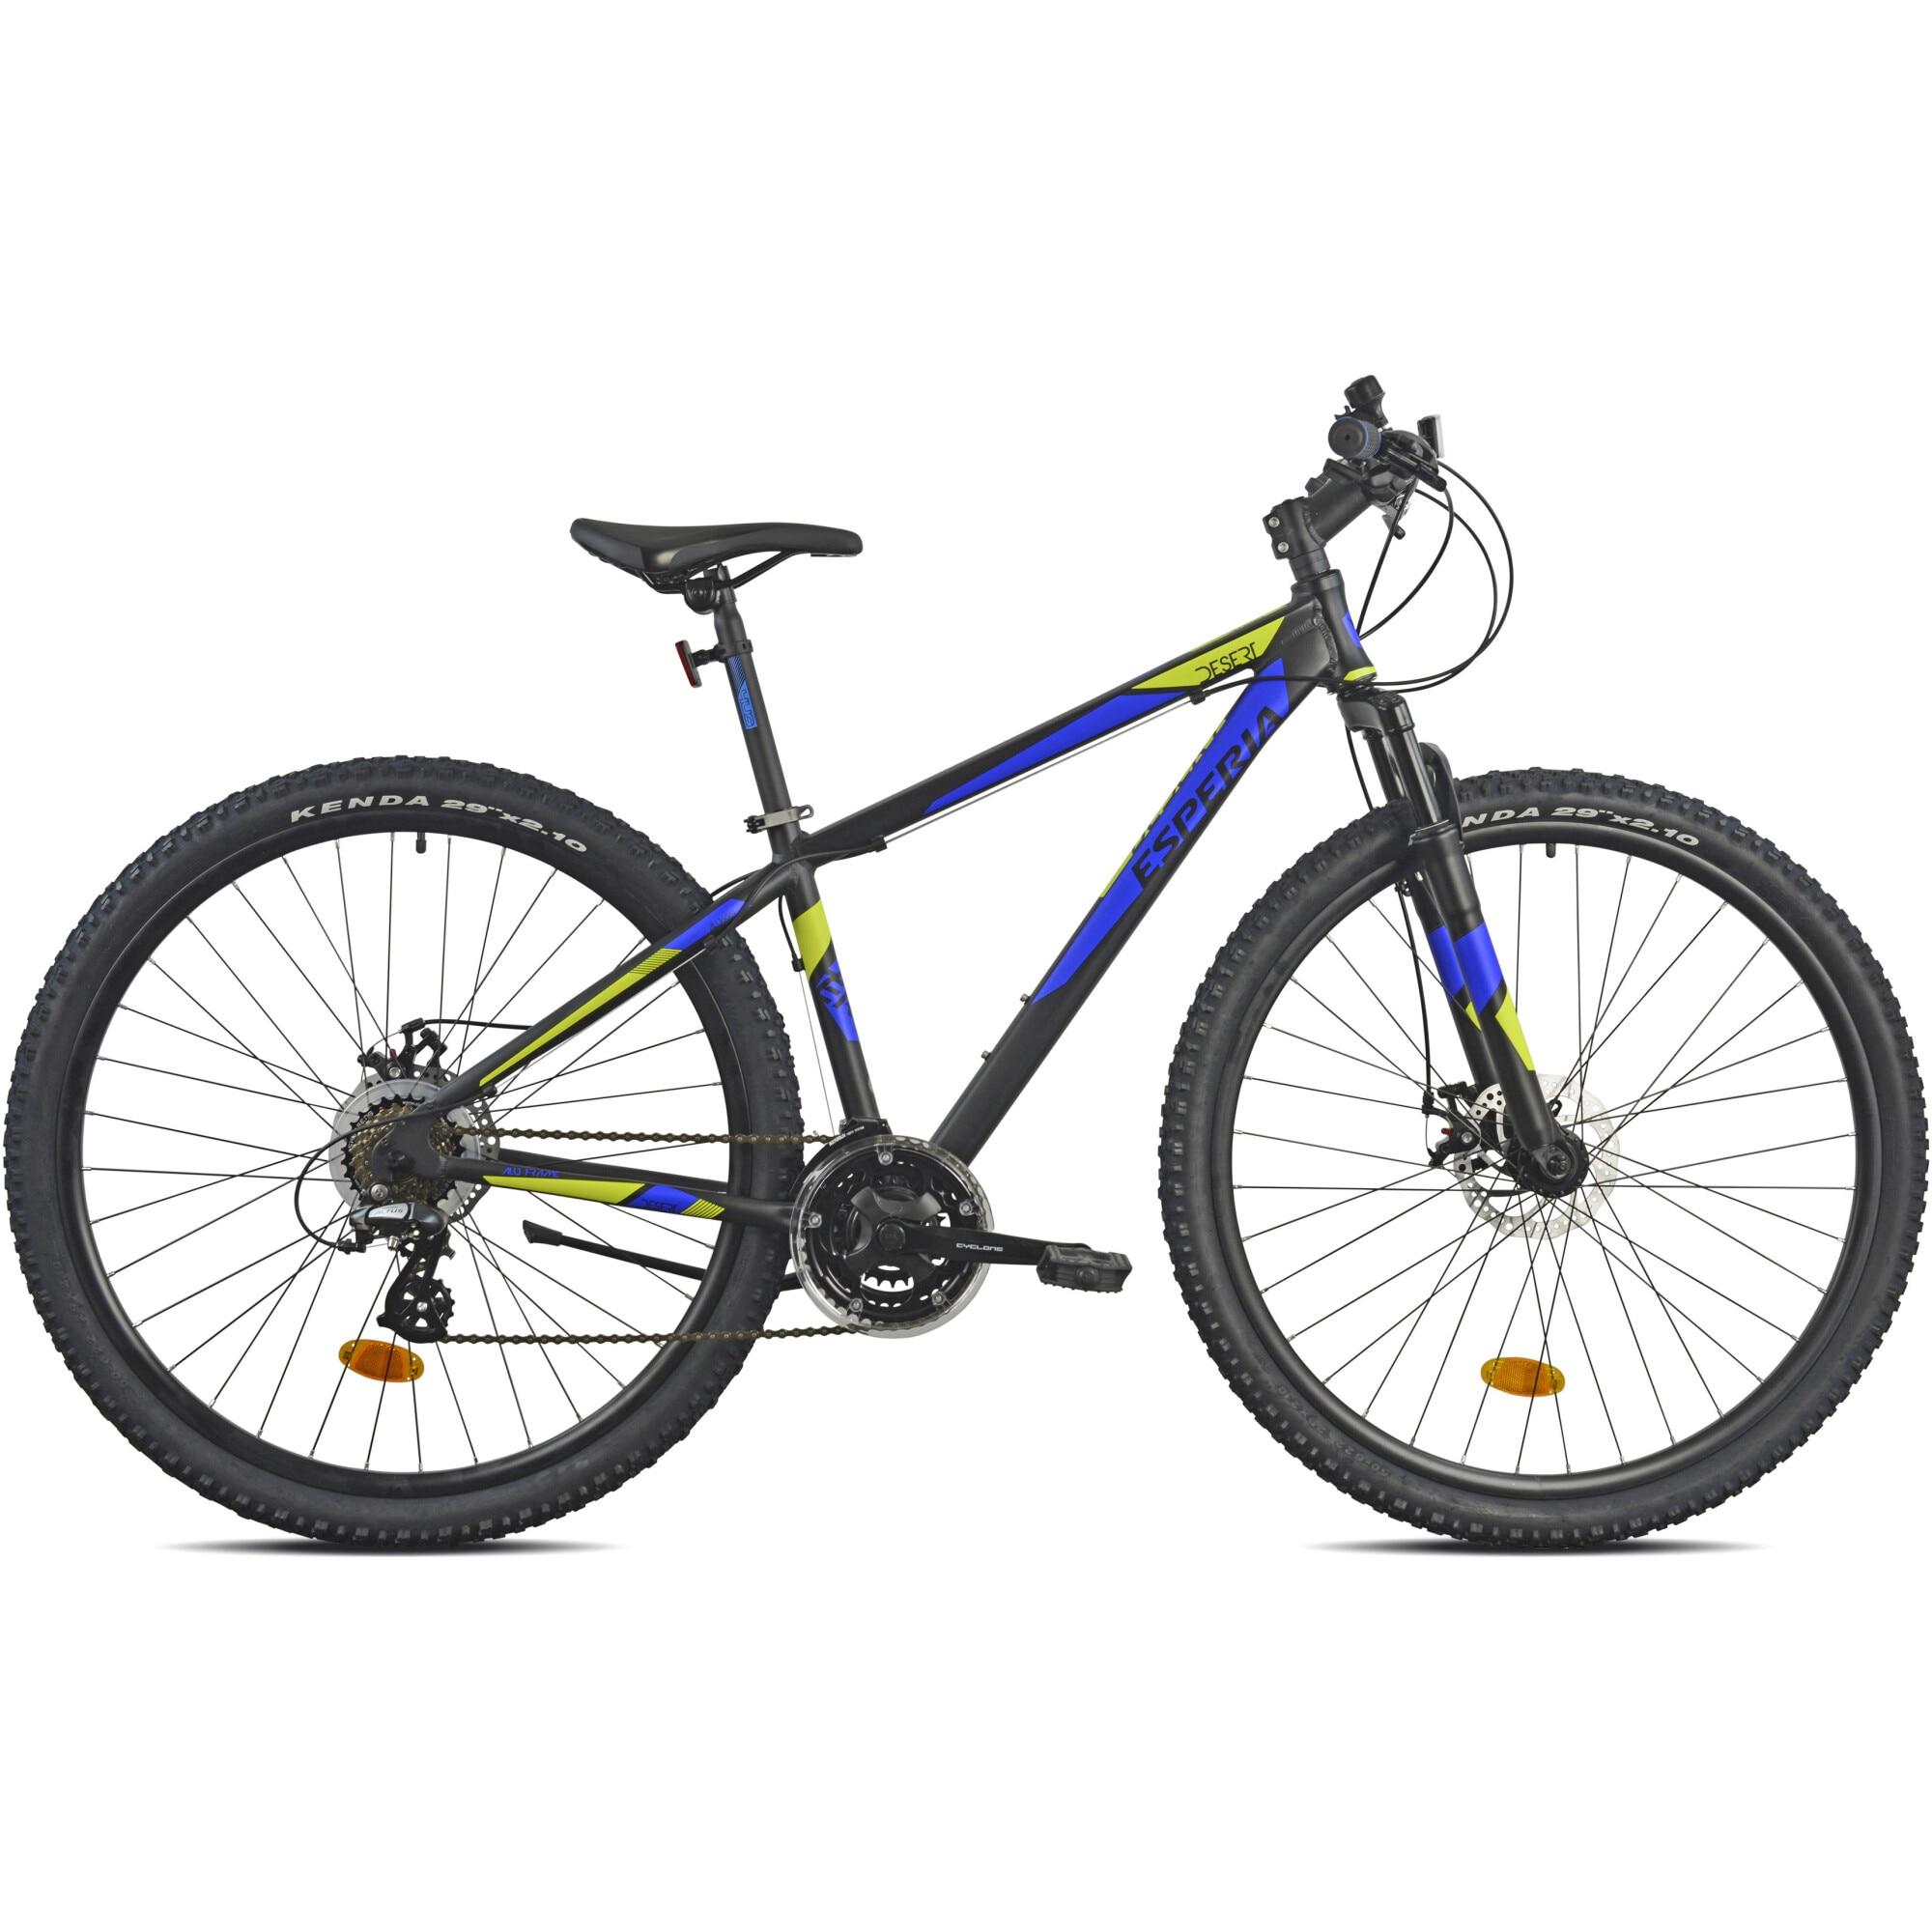 Fotografie Bicicleta MTB 29-er Esperia Cadru Al, Shimano, Negru/Albastru/Galben, 40cm